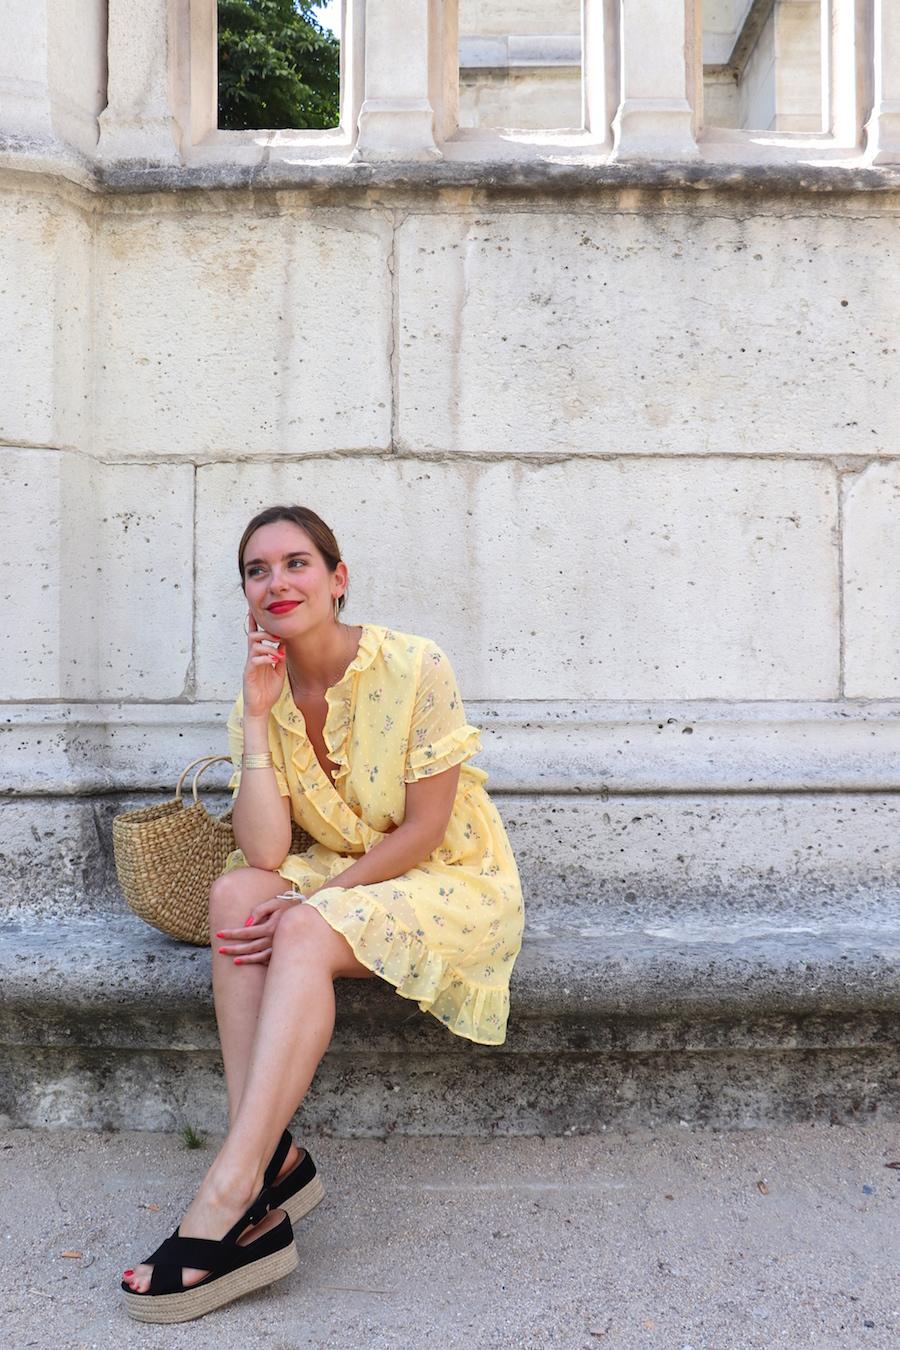 robe jaune fleurie h&m 2